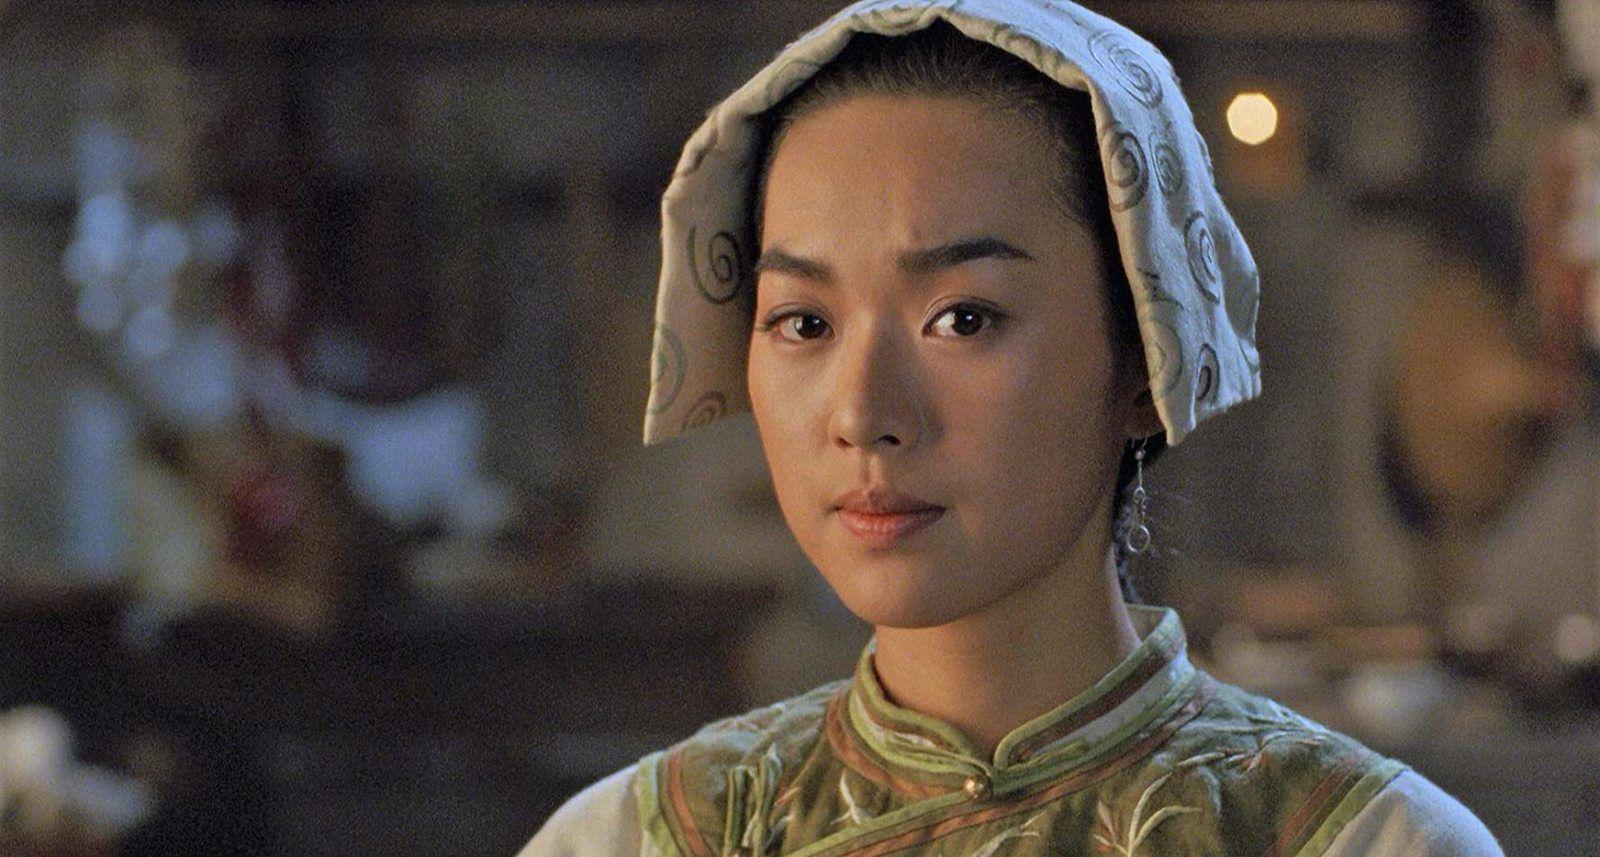 IRON MONKEY (BANDE ANNONCE VO) EN DVD LE 25 08 2009 (Siu nin Wong Fei Hung ji Tit Ma Lau)